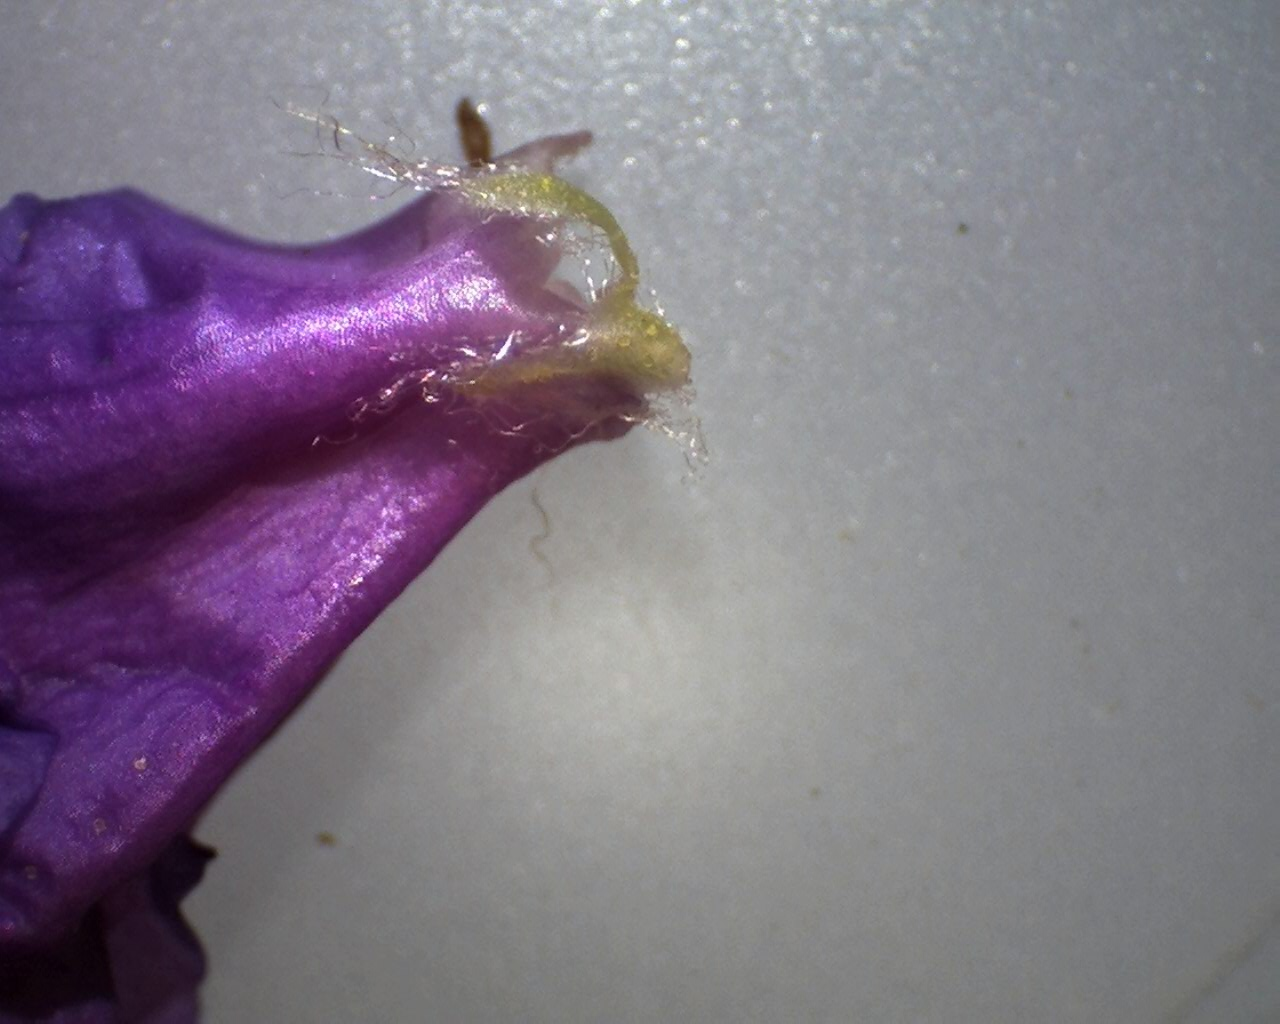 Rh. augustinii ssp. augustinii hårede bægerbl.